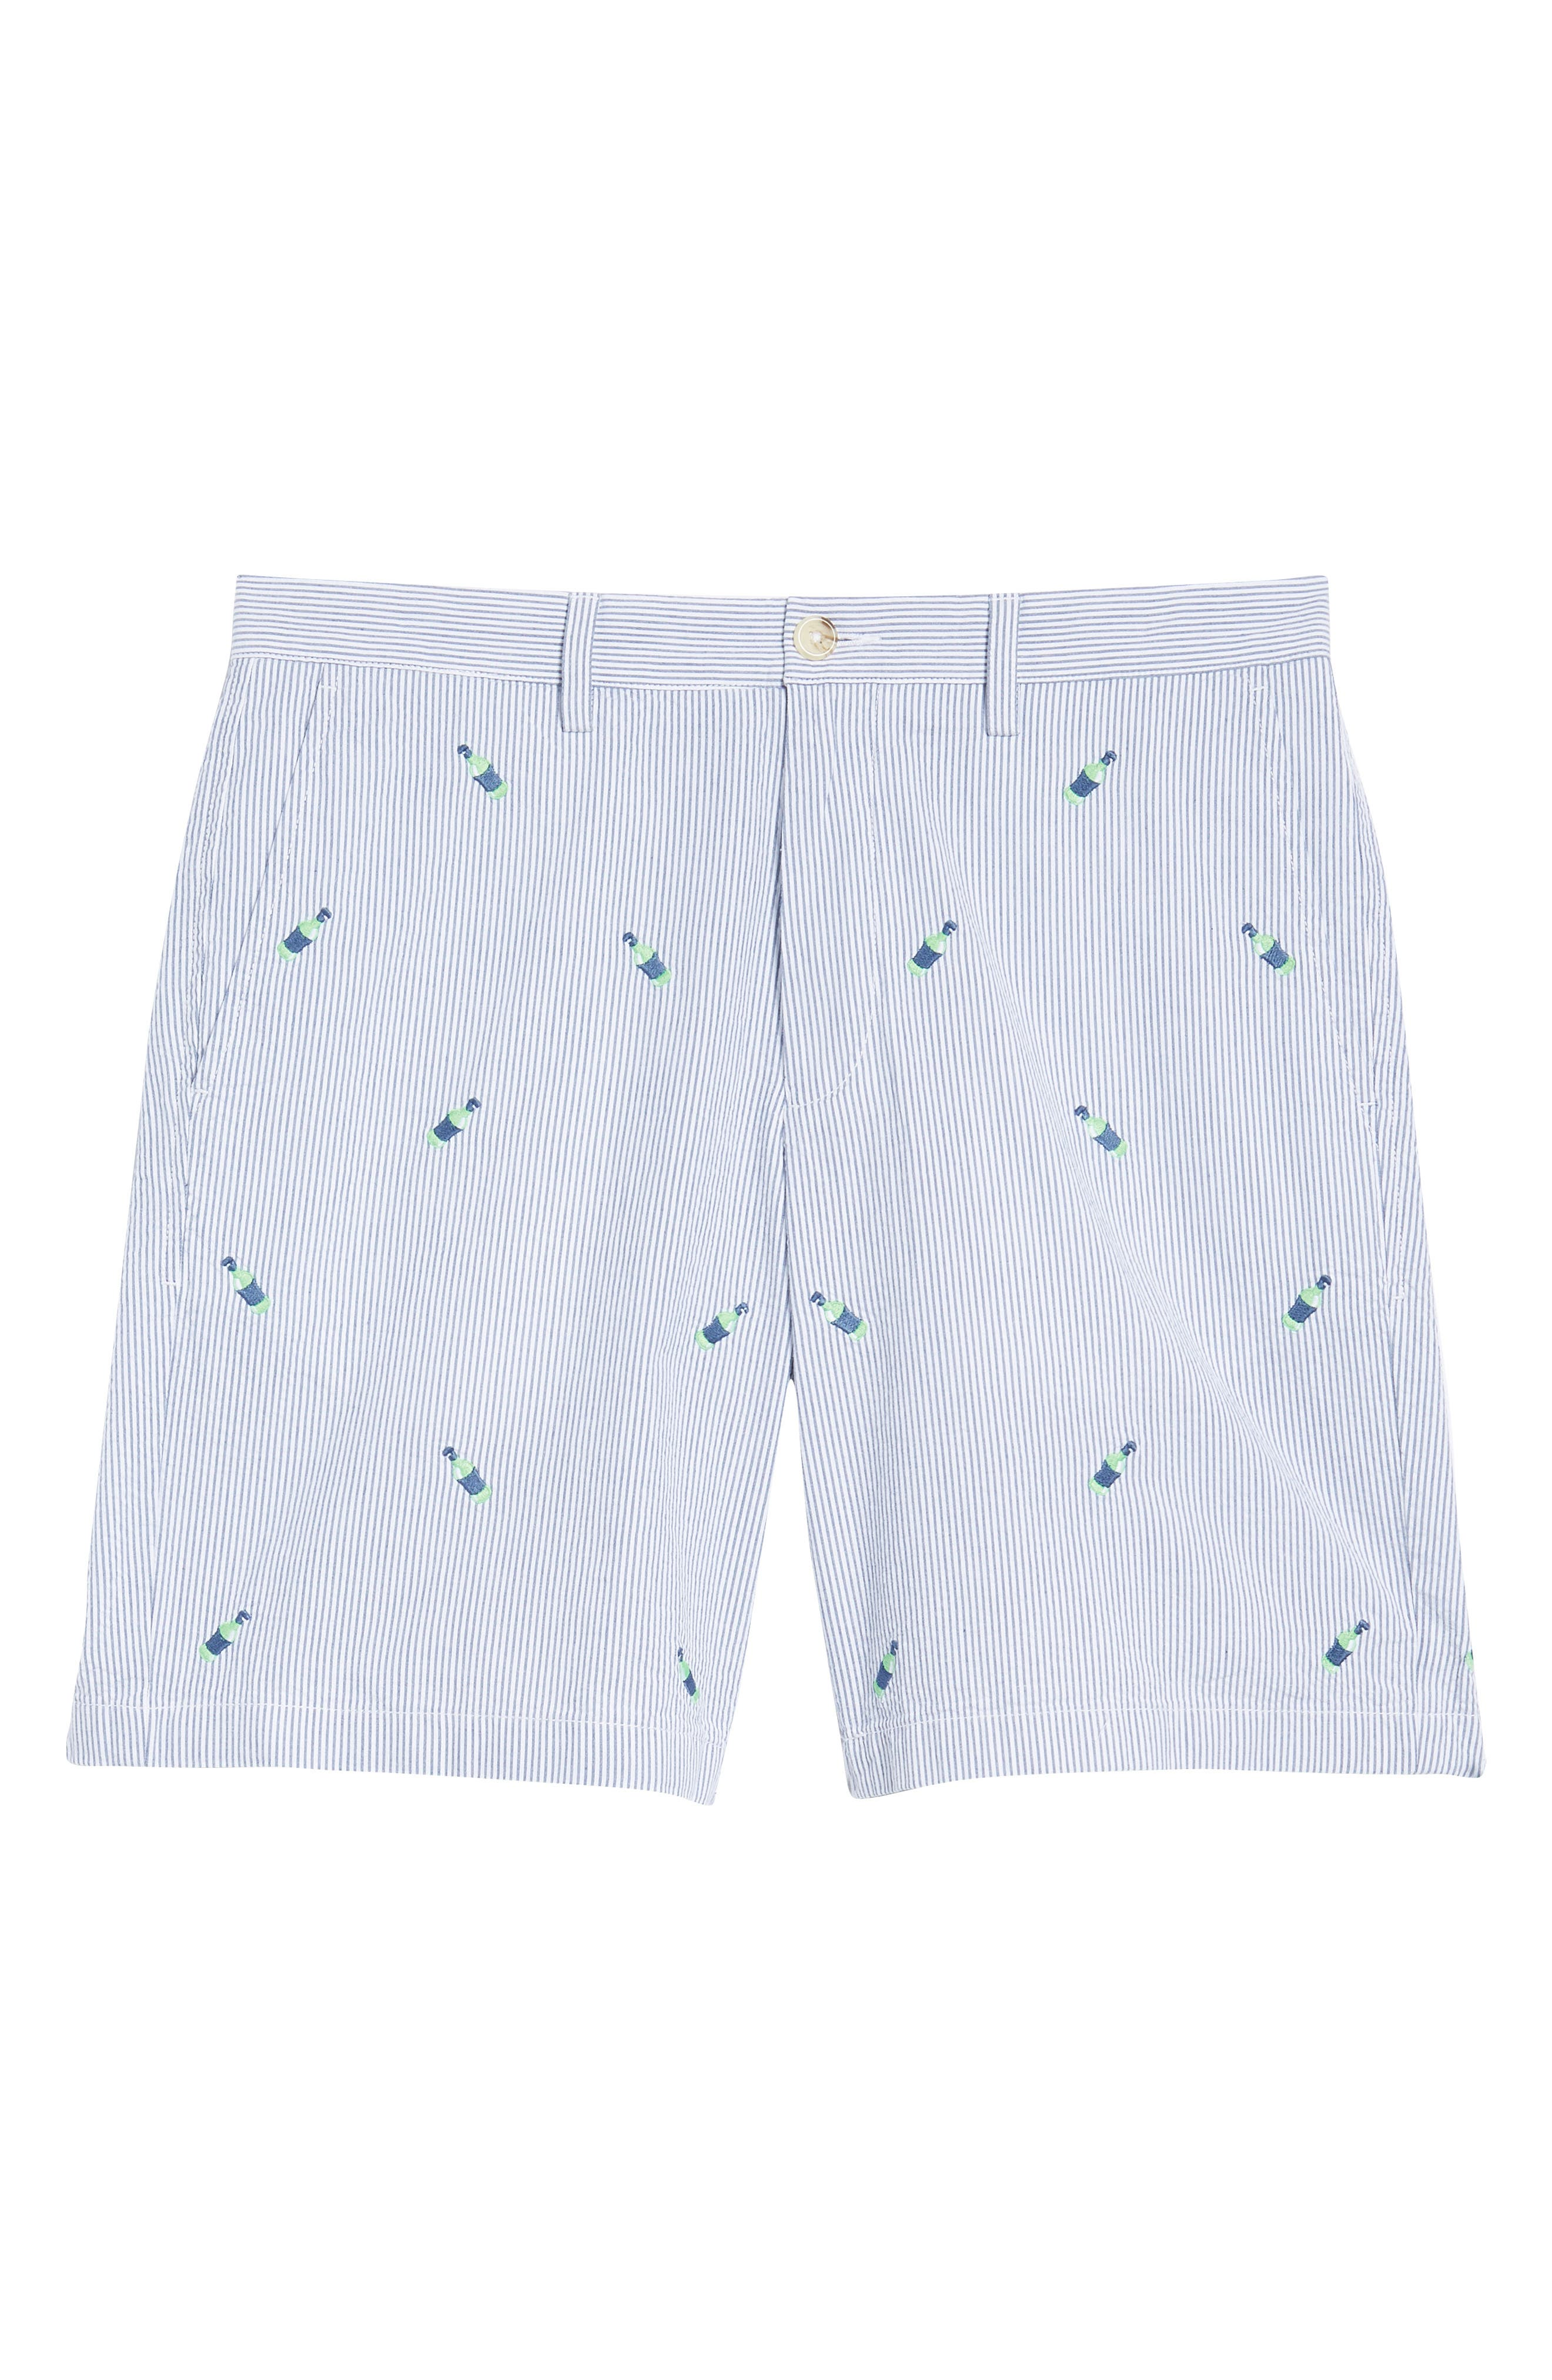 Embroidered Seersucker Shorts,                             Alternate thumbnail 6, color,                             Seven Seas Blue